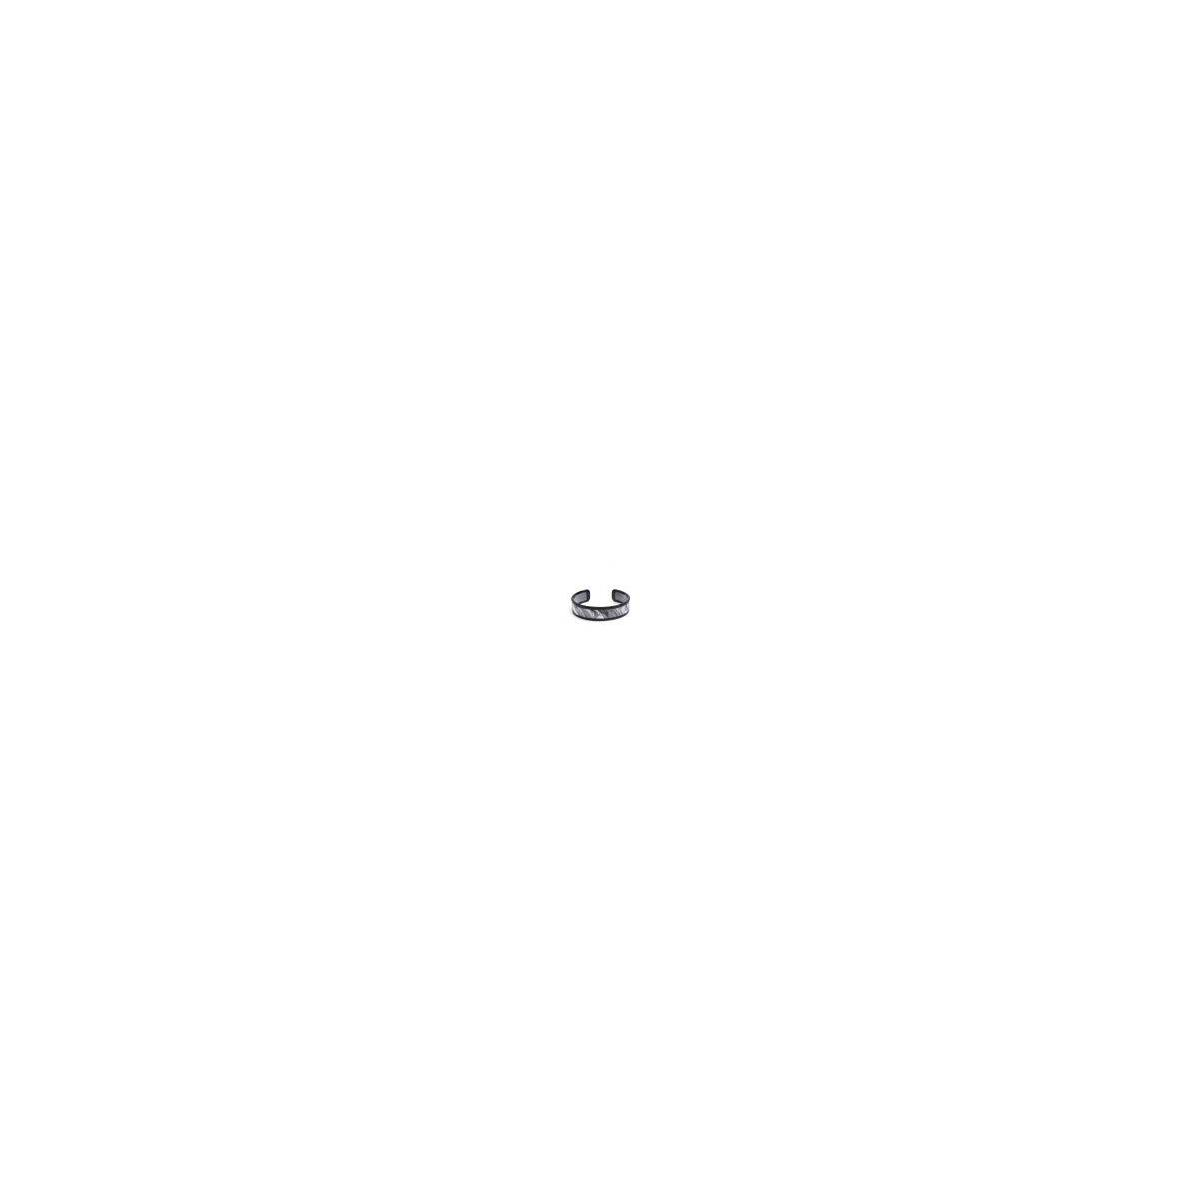 Skinny Lined Tortoise Cuff Bracelet | Stylish Costume Jewelry, Gray